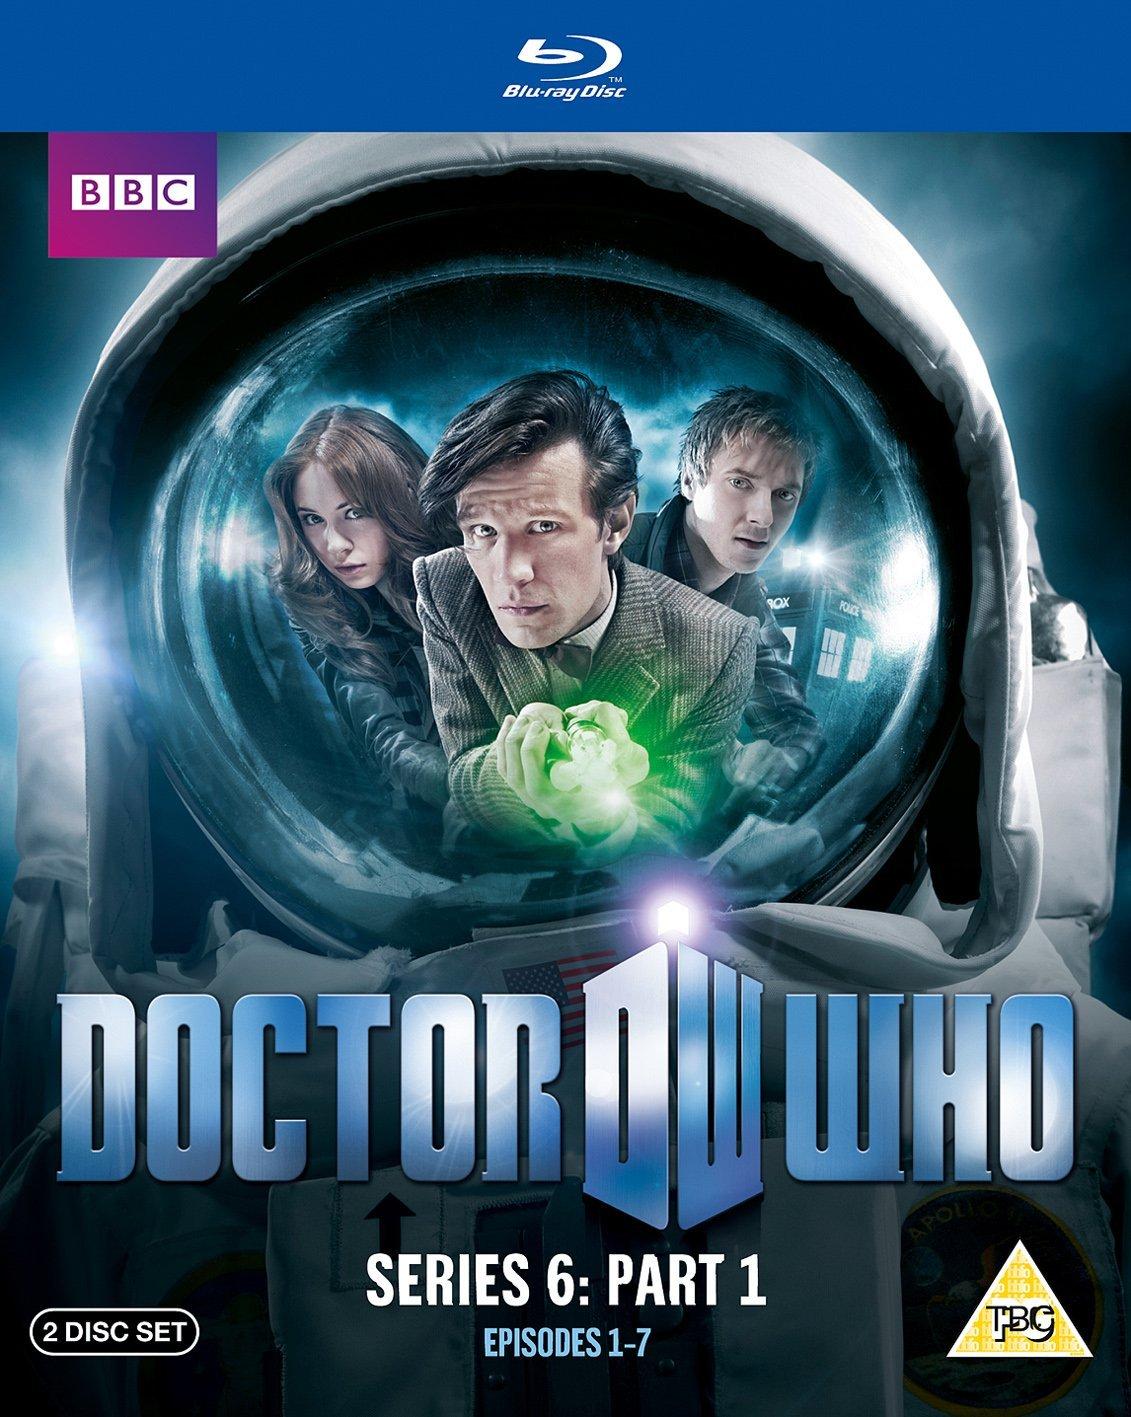 Doctor Who - Series 6 Part 1 [Reino Unido] [Blu-ray]: Amazon.es: Matt Smith, Karen Gillan, Arthur Darvill, Alex Kingston, Suranne Jones, Michael Sheen, Mark Sheppard, Stuart Milligan, Kerry Shale, Hugh Bonneville, Oscar